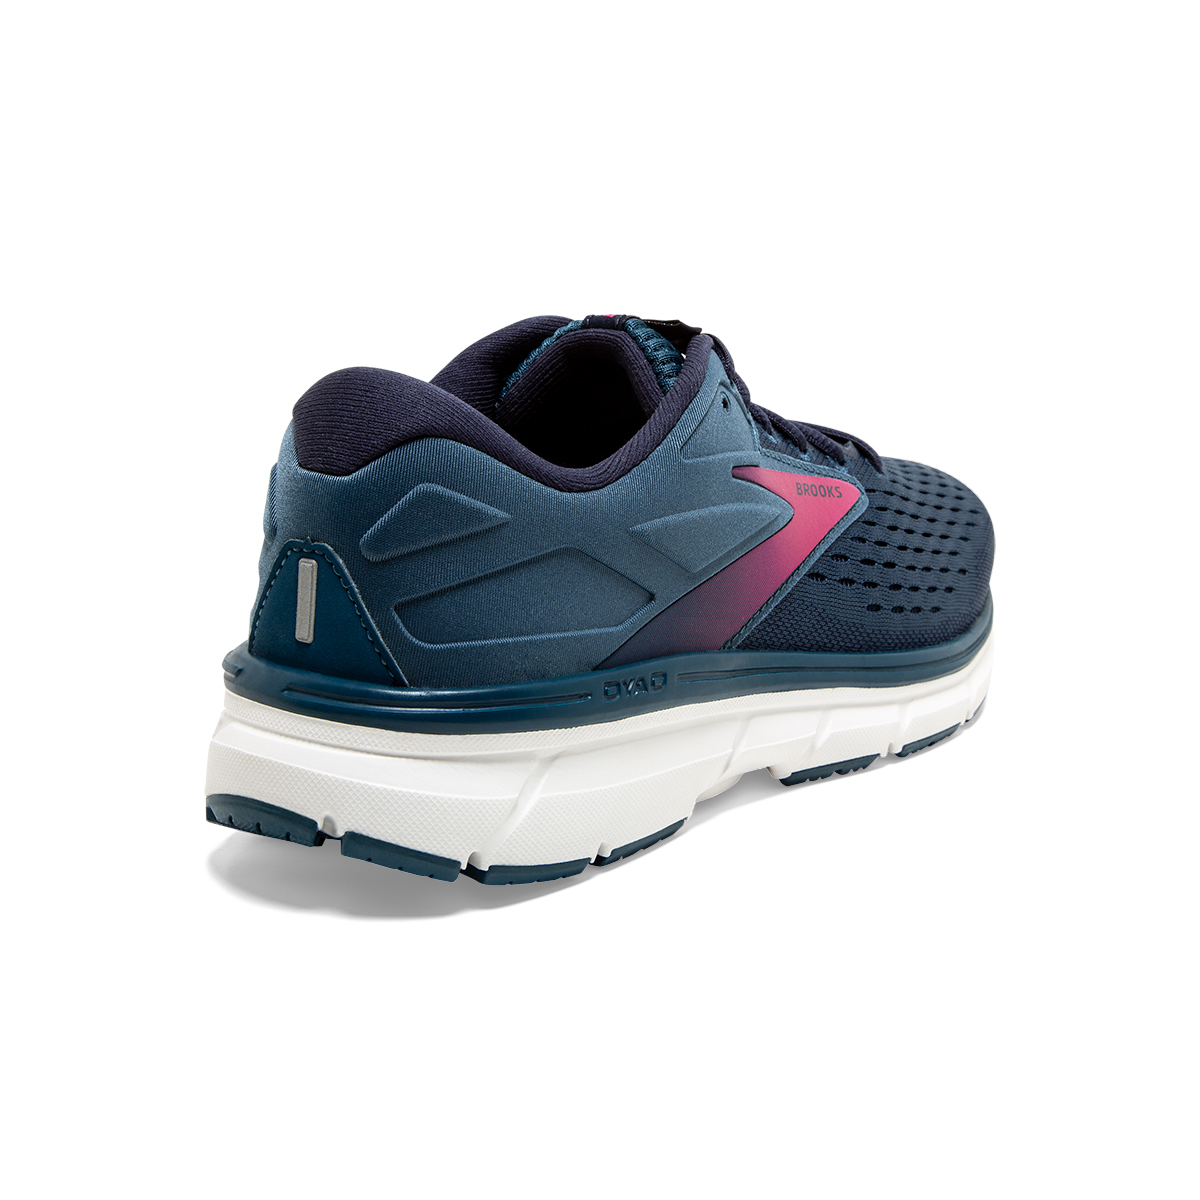 Women's Brooks Dyad 11 Running Shoe - Color: Blue/Navy/Beetroot (Regular Width) - Size: 7.5, Blue/Navy/Beetroot, large, image 4